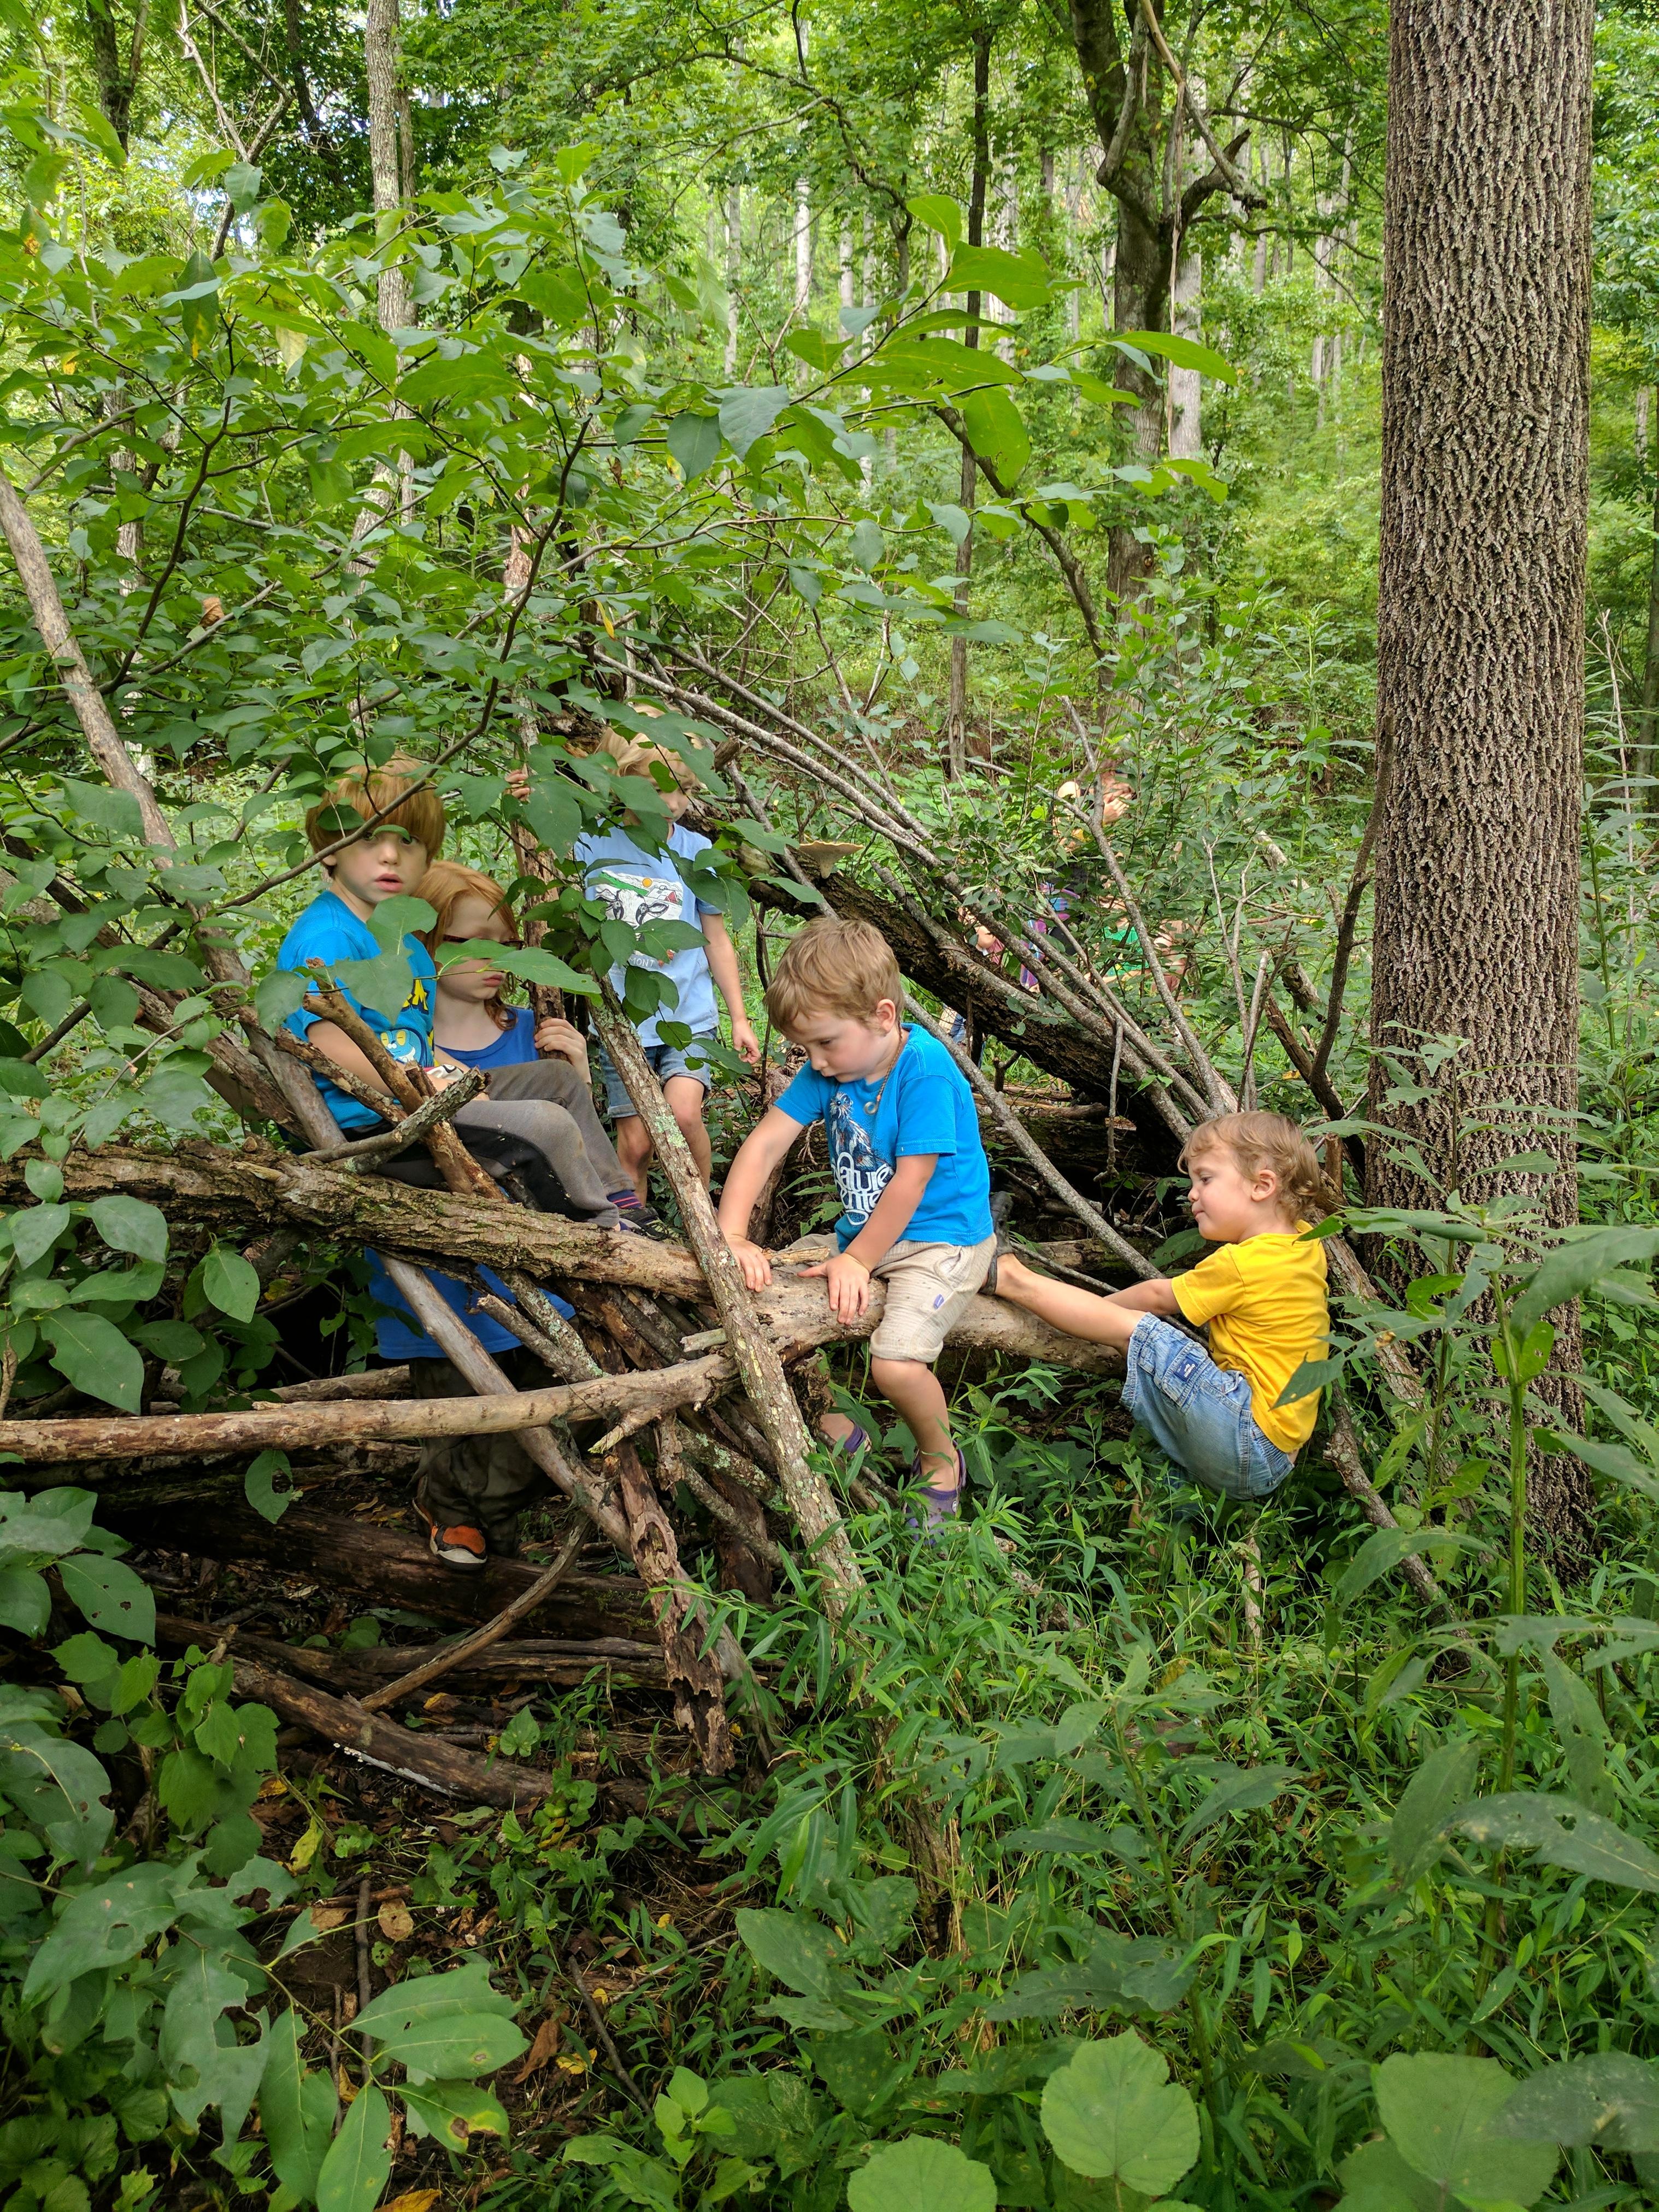 Ashevillefarmstead-kids-Fortville-forest-freeplay